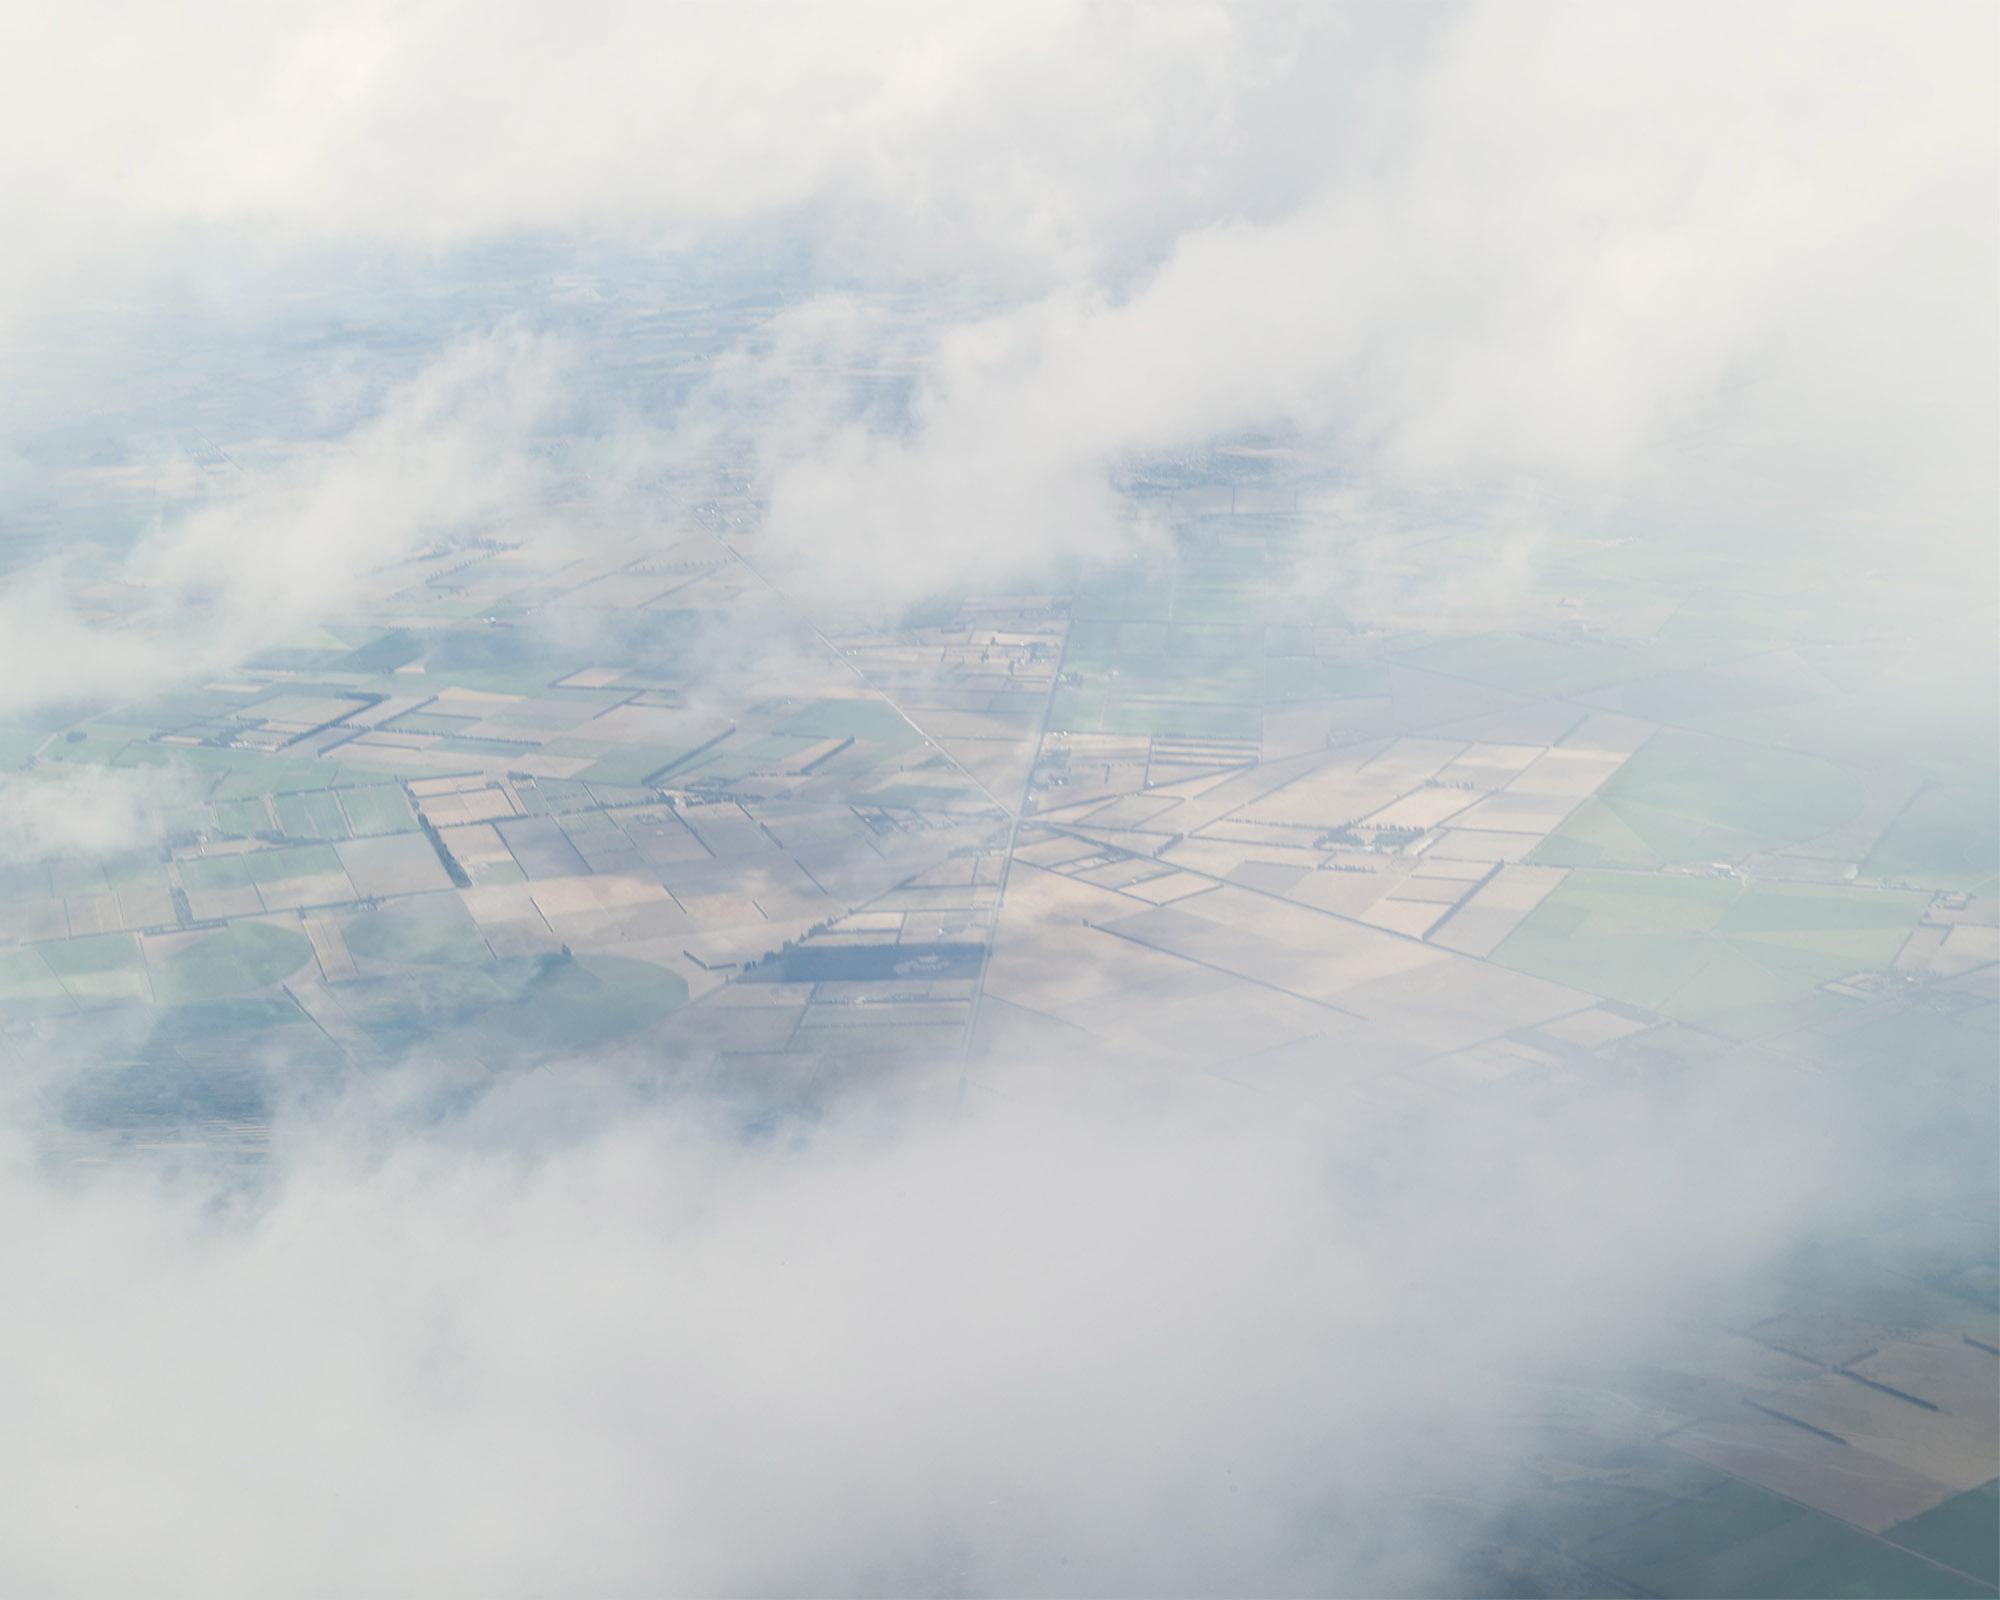 Central Plains Water Enhancement Scheme, Canterbury, New Zealand 2015. © Alan McFetridge